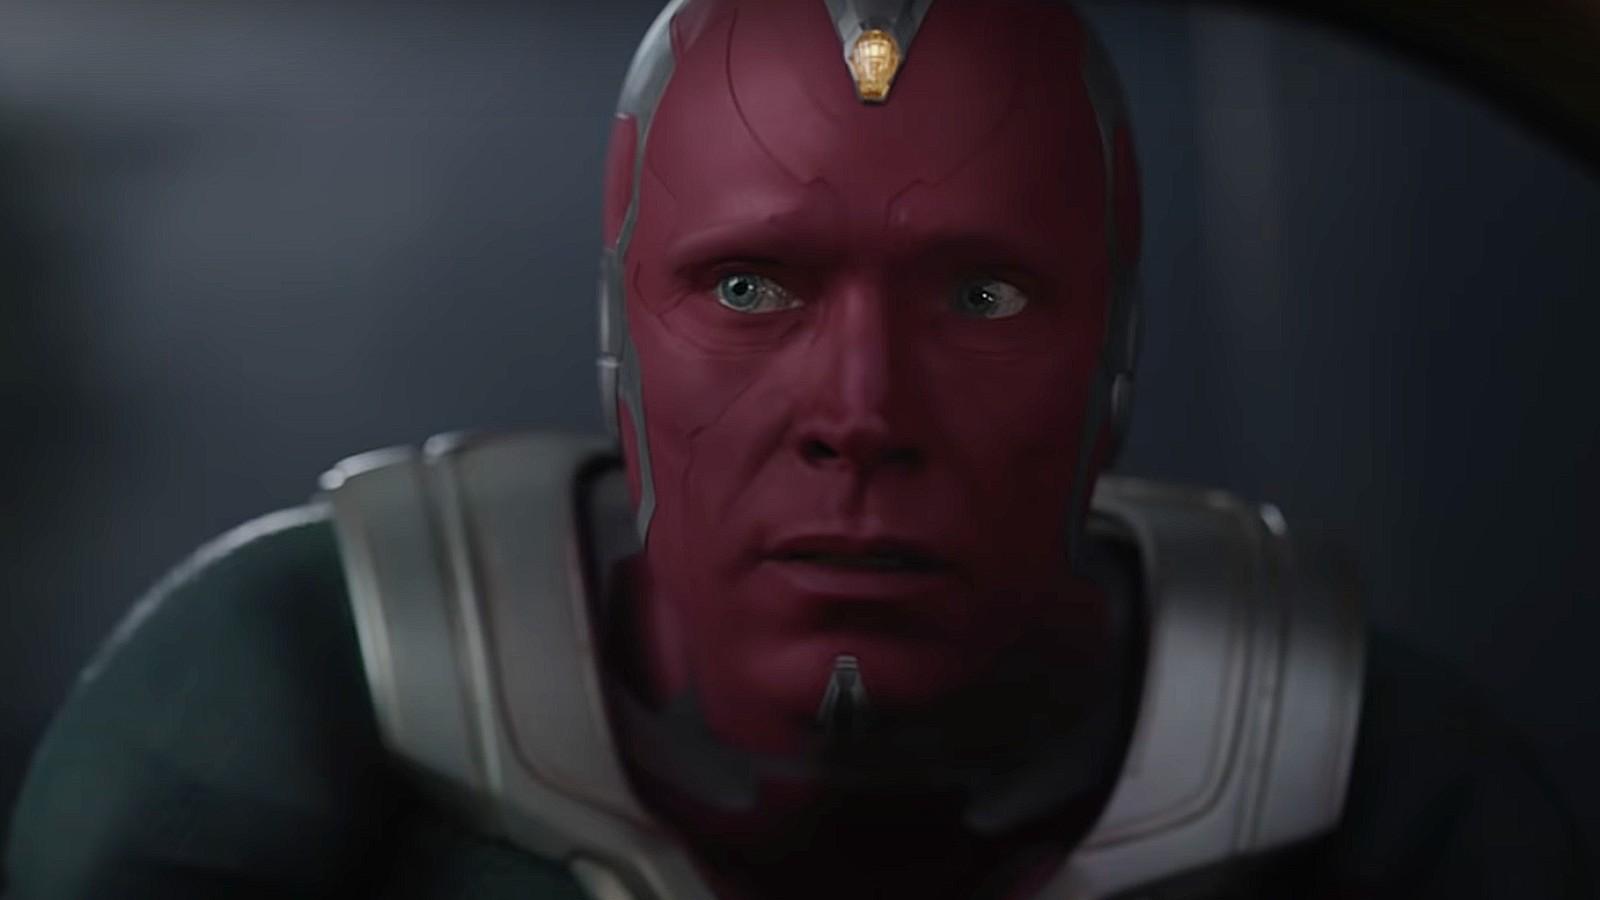 Vision in Marvel's WandaVision trailer